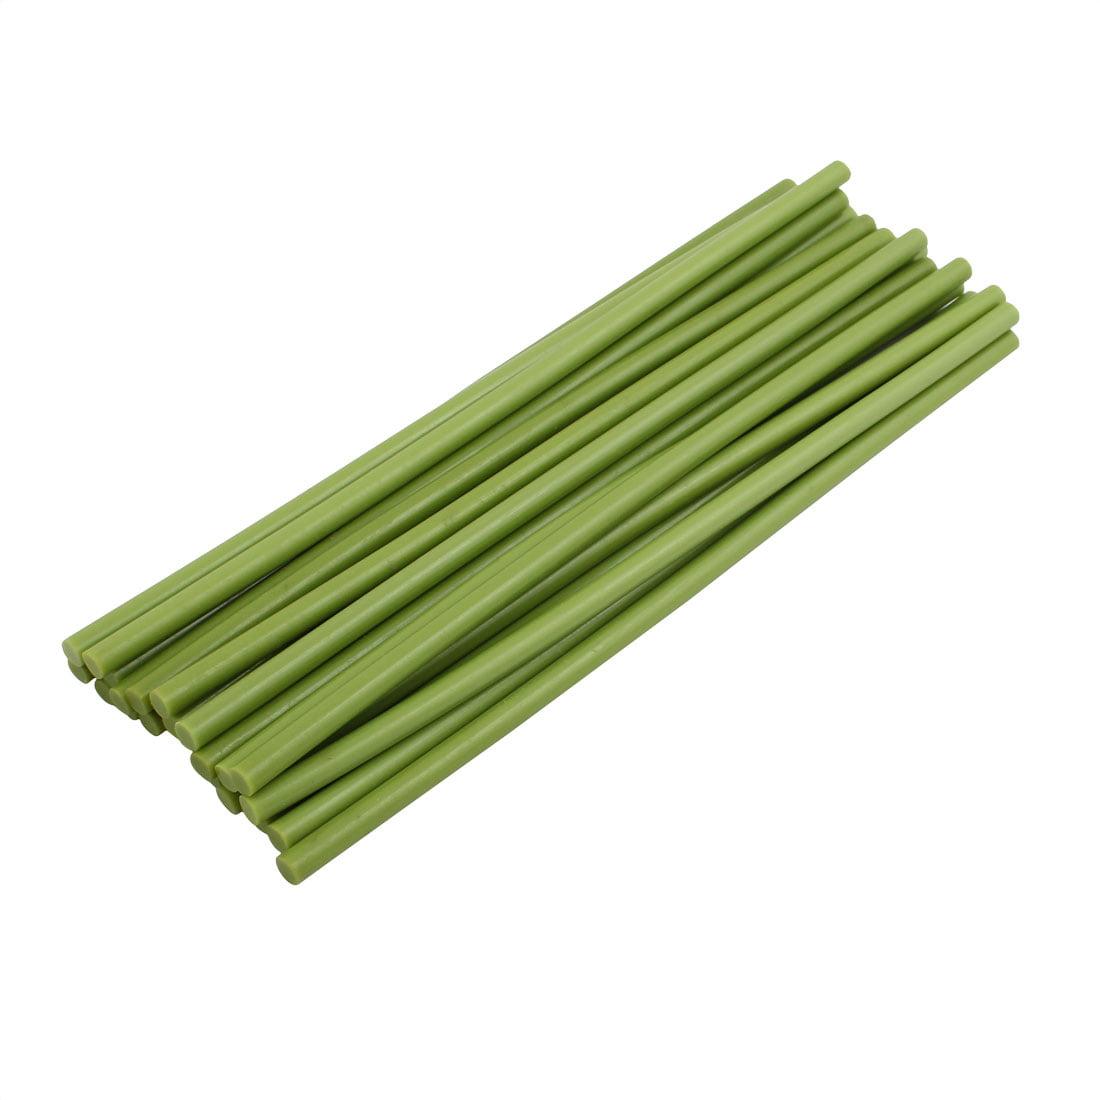 25 Pcs Light Green 7mm Dia Soldering Iron Hot Melt Glue Stick 253mm Length